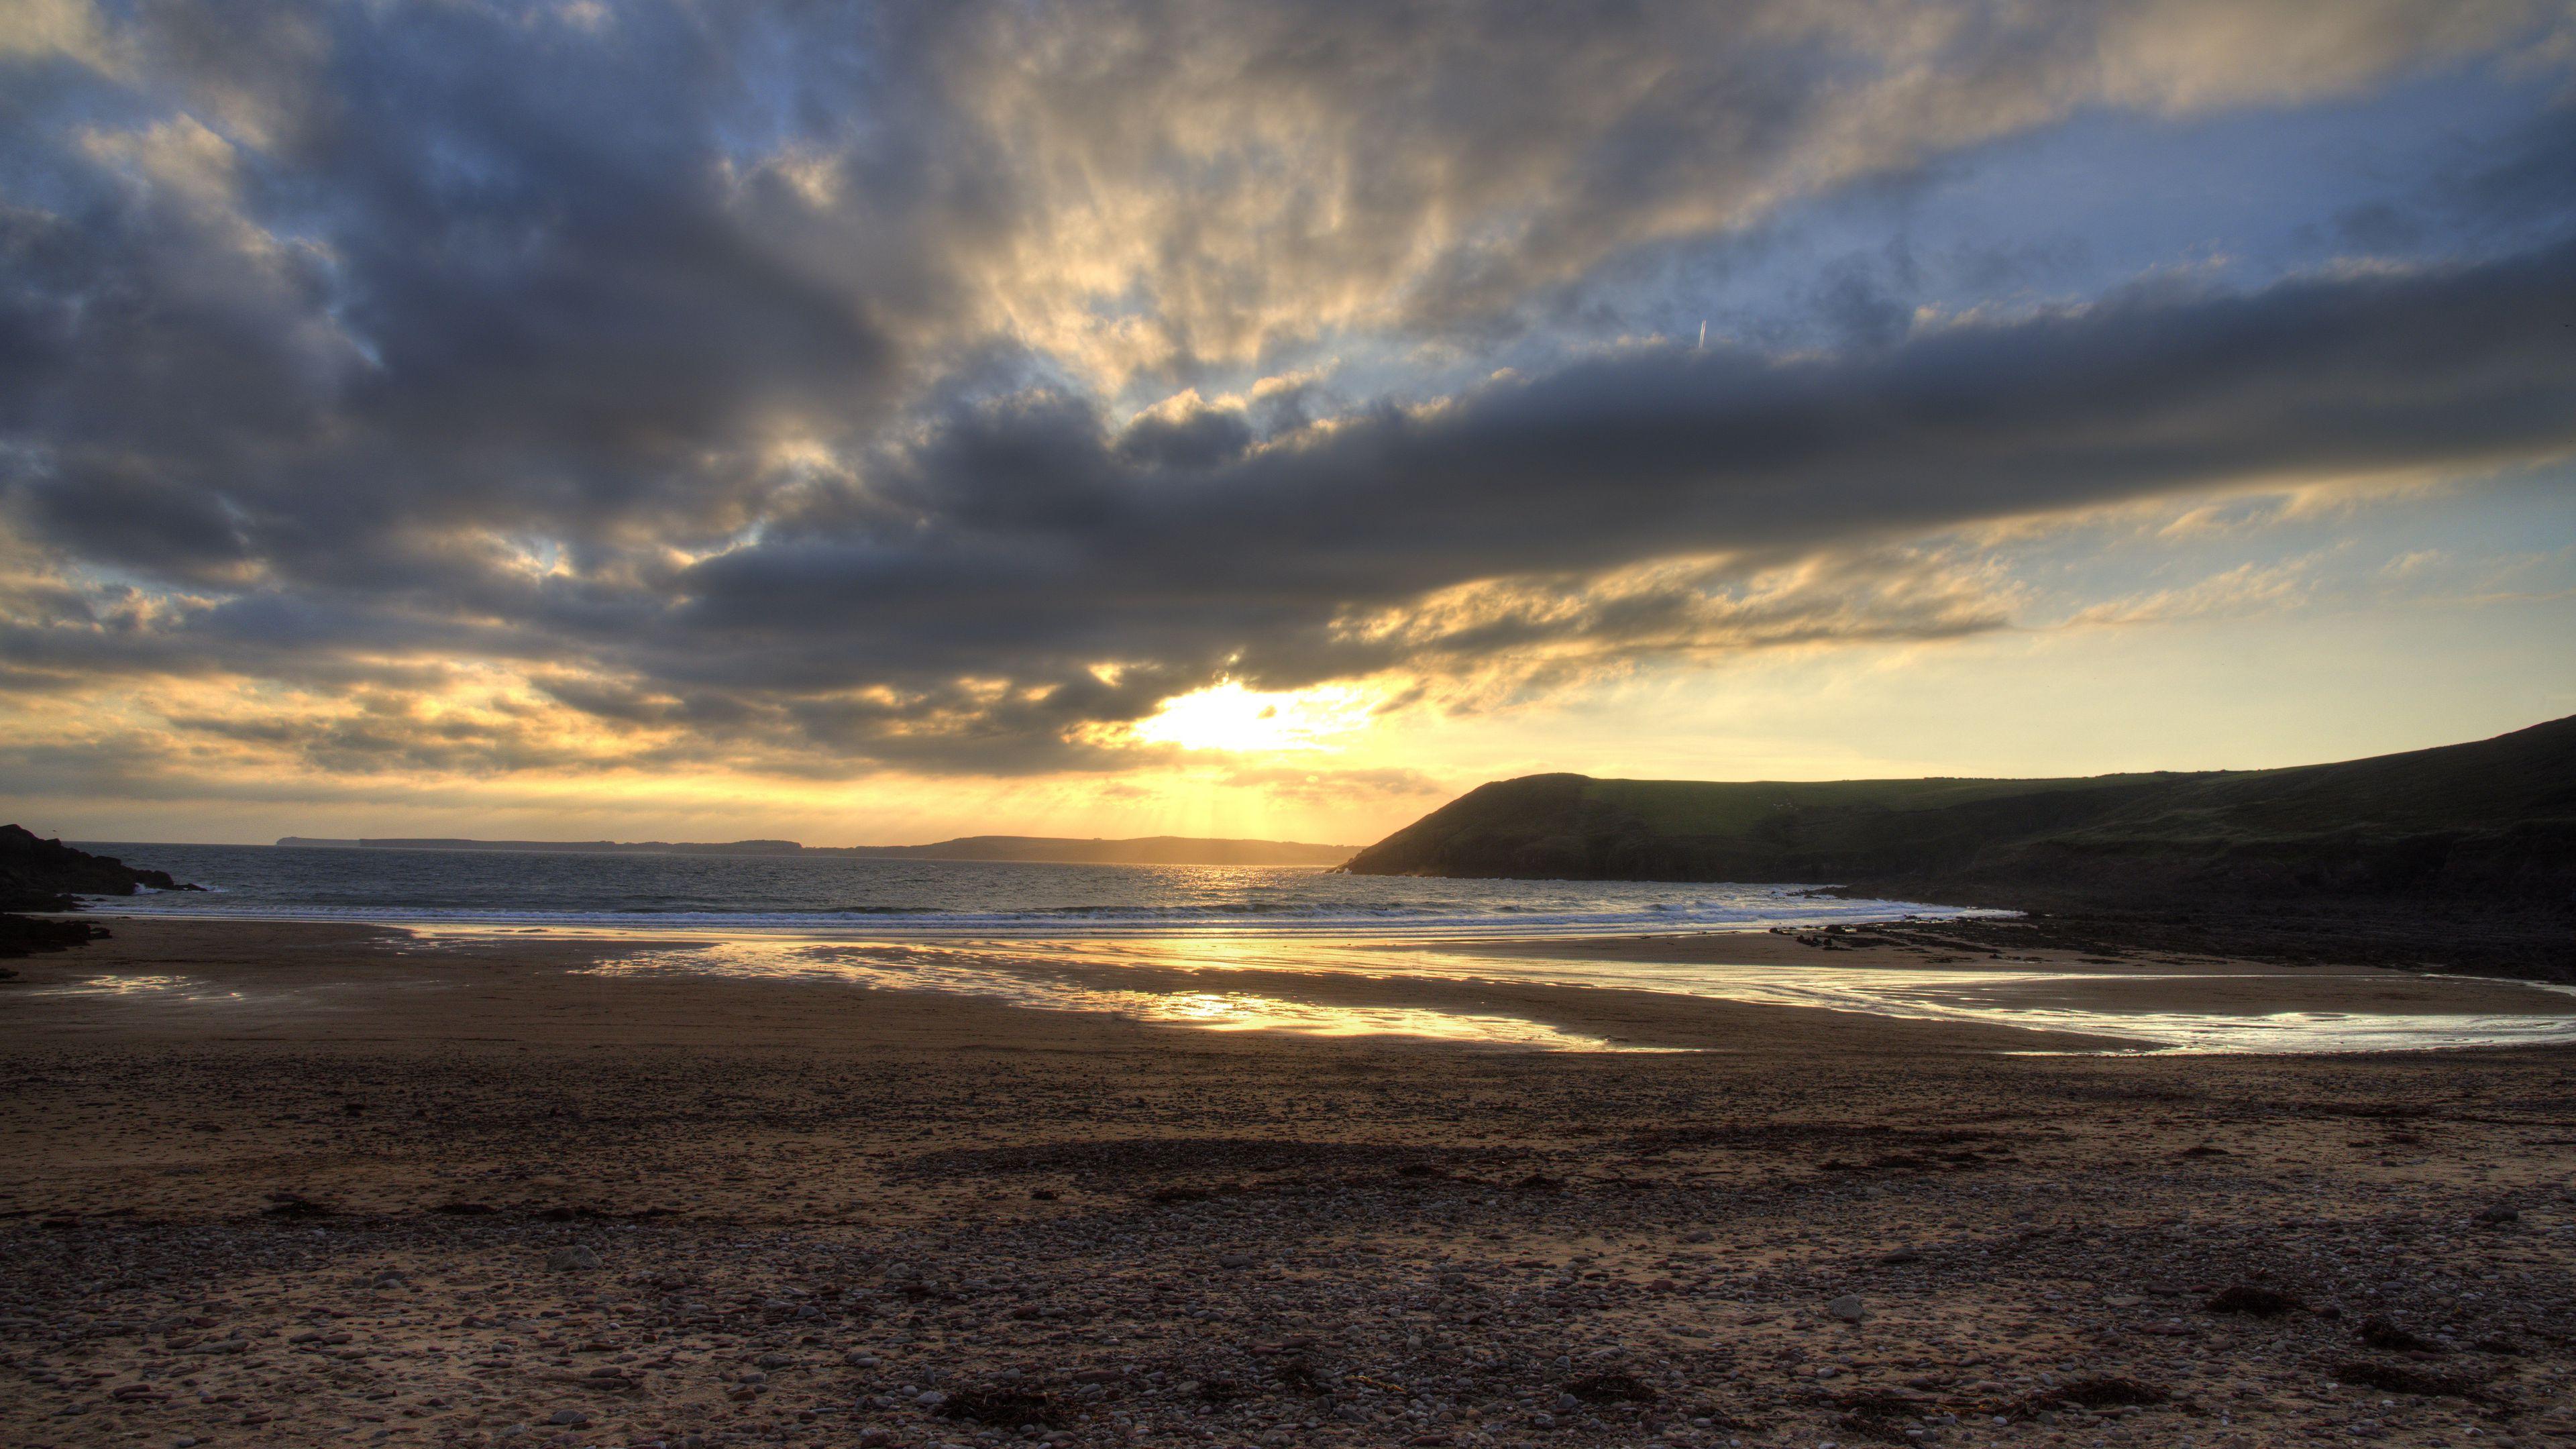 3840x2160 Wallpaper shore, water, sunset, landscape